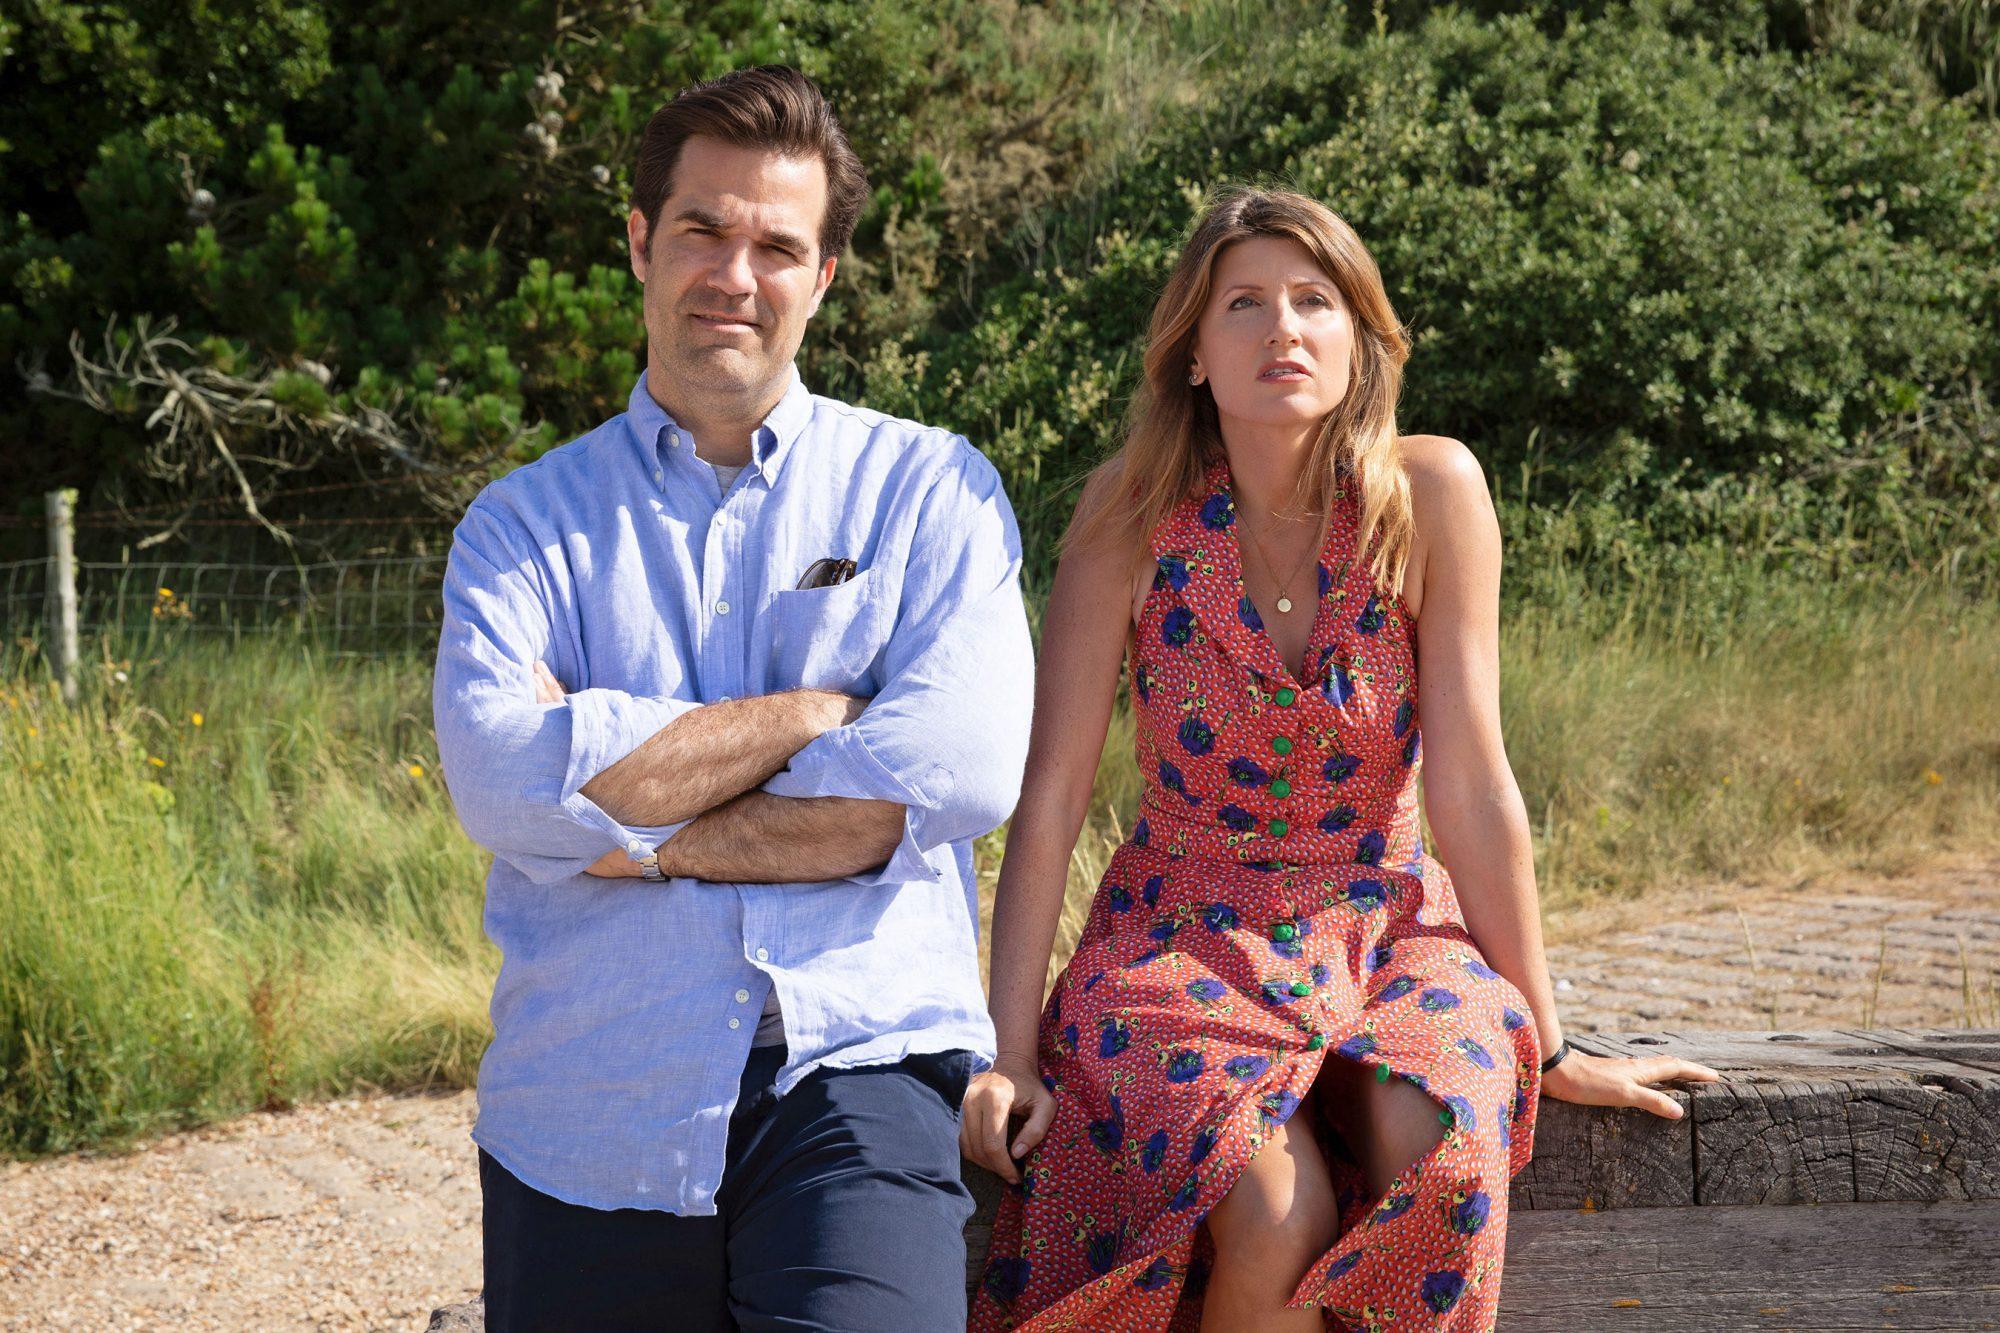 episodics from season4 of Catastrophefeaturing Rob Delaney and Sharon Horgan